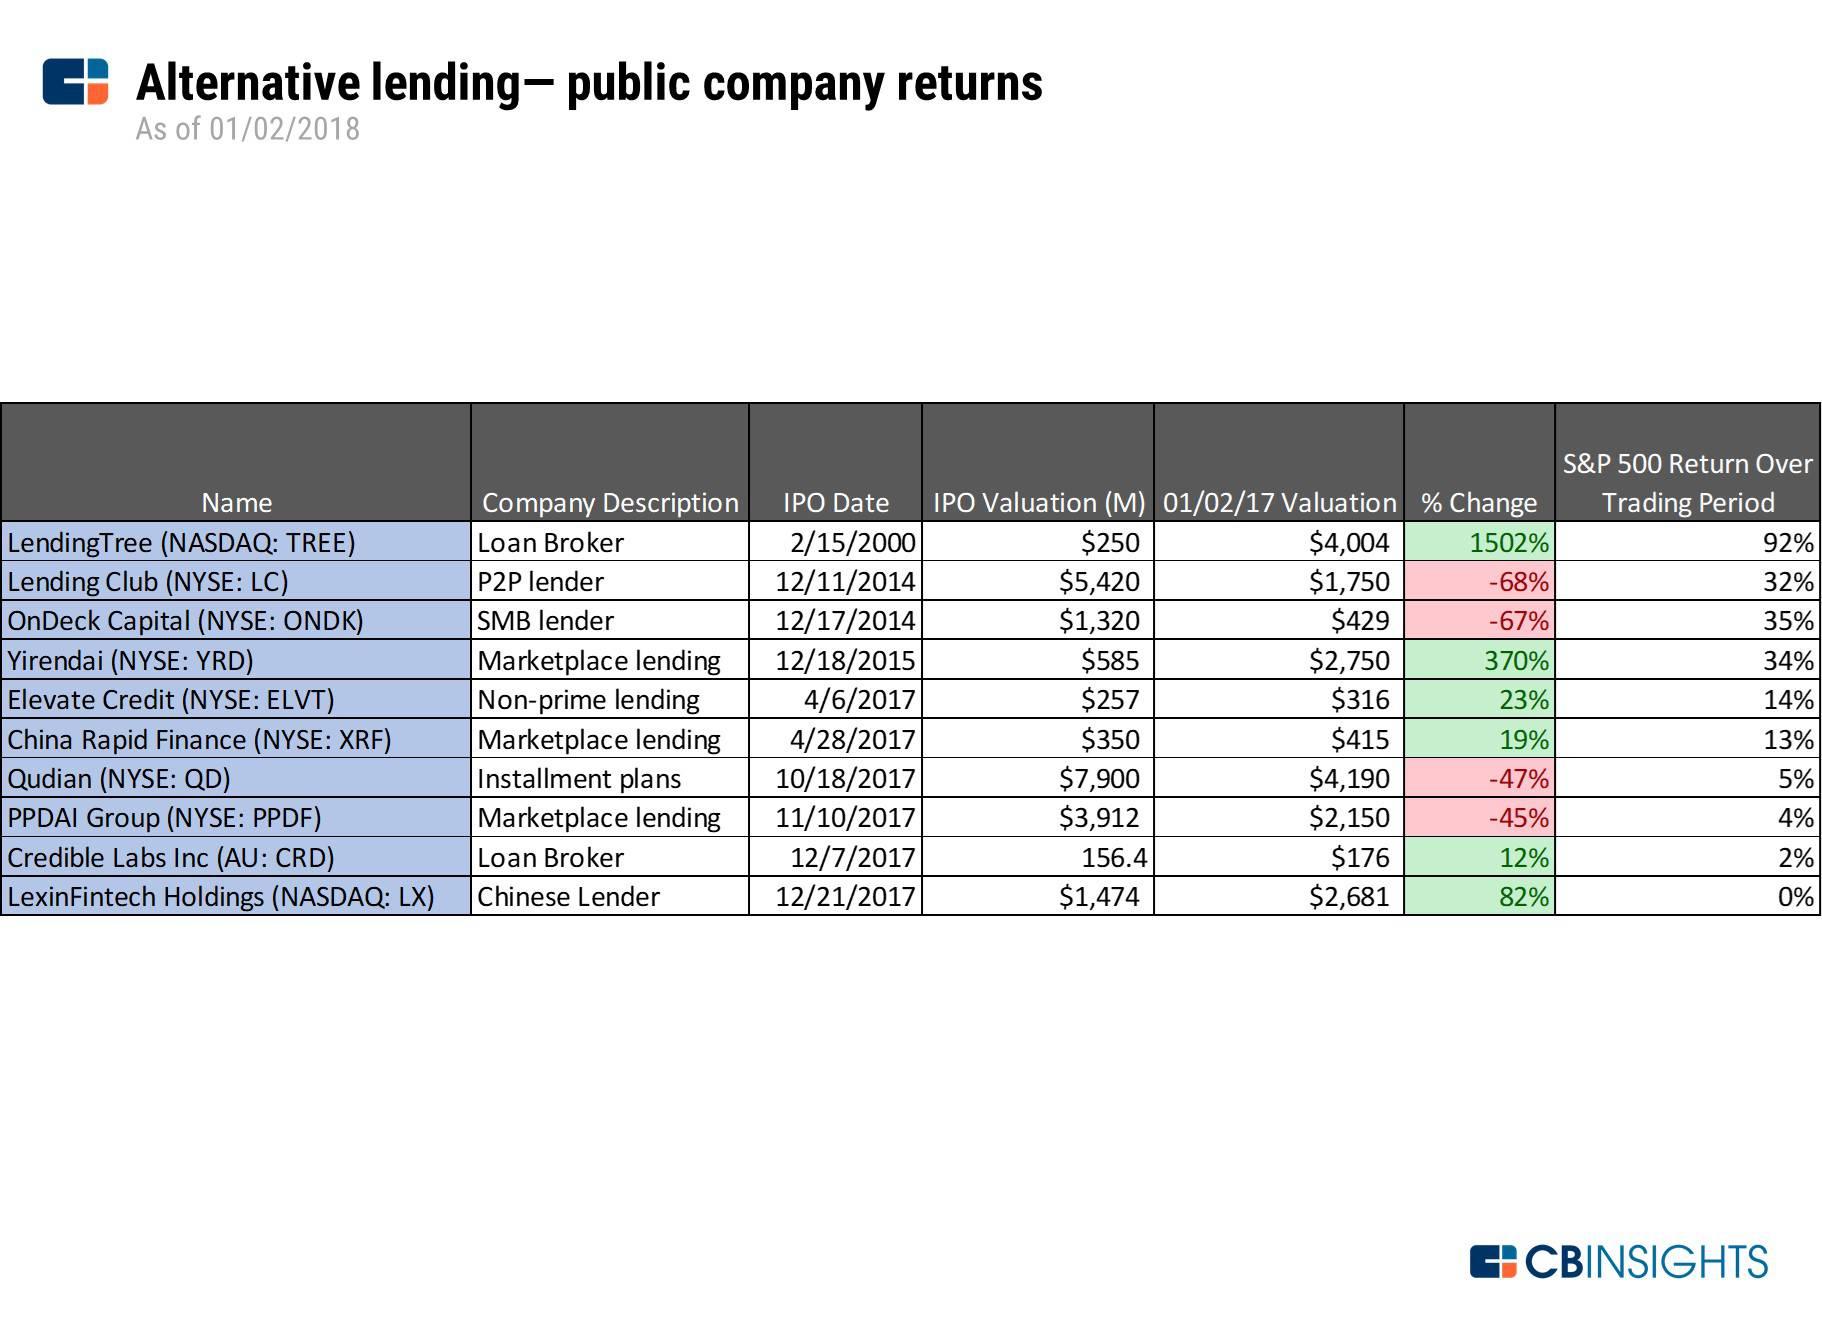 Alternative lending - public company returns